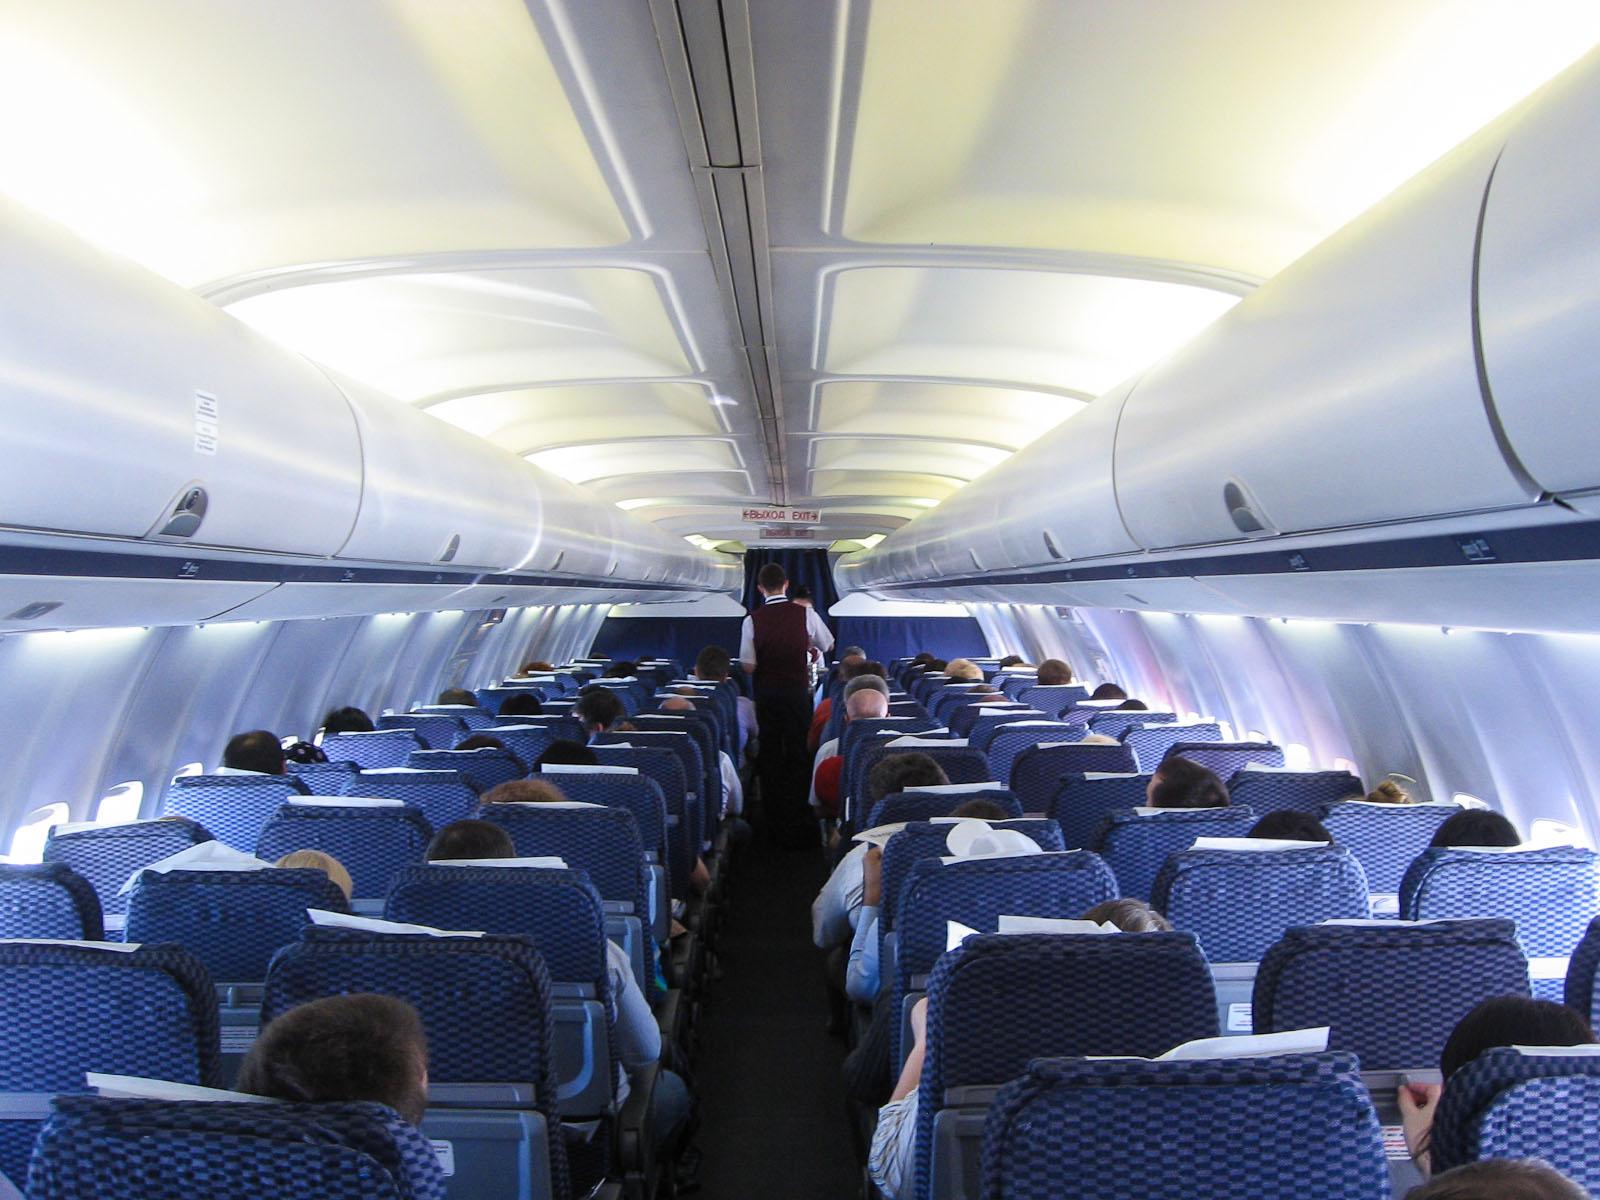 Пассажирский салон в самолете Боинг-737-500 авиакомпании ЮТэйр